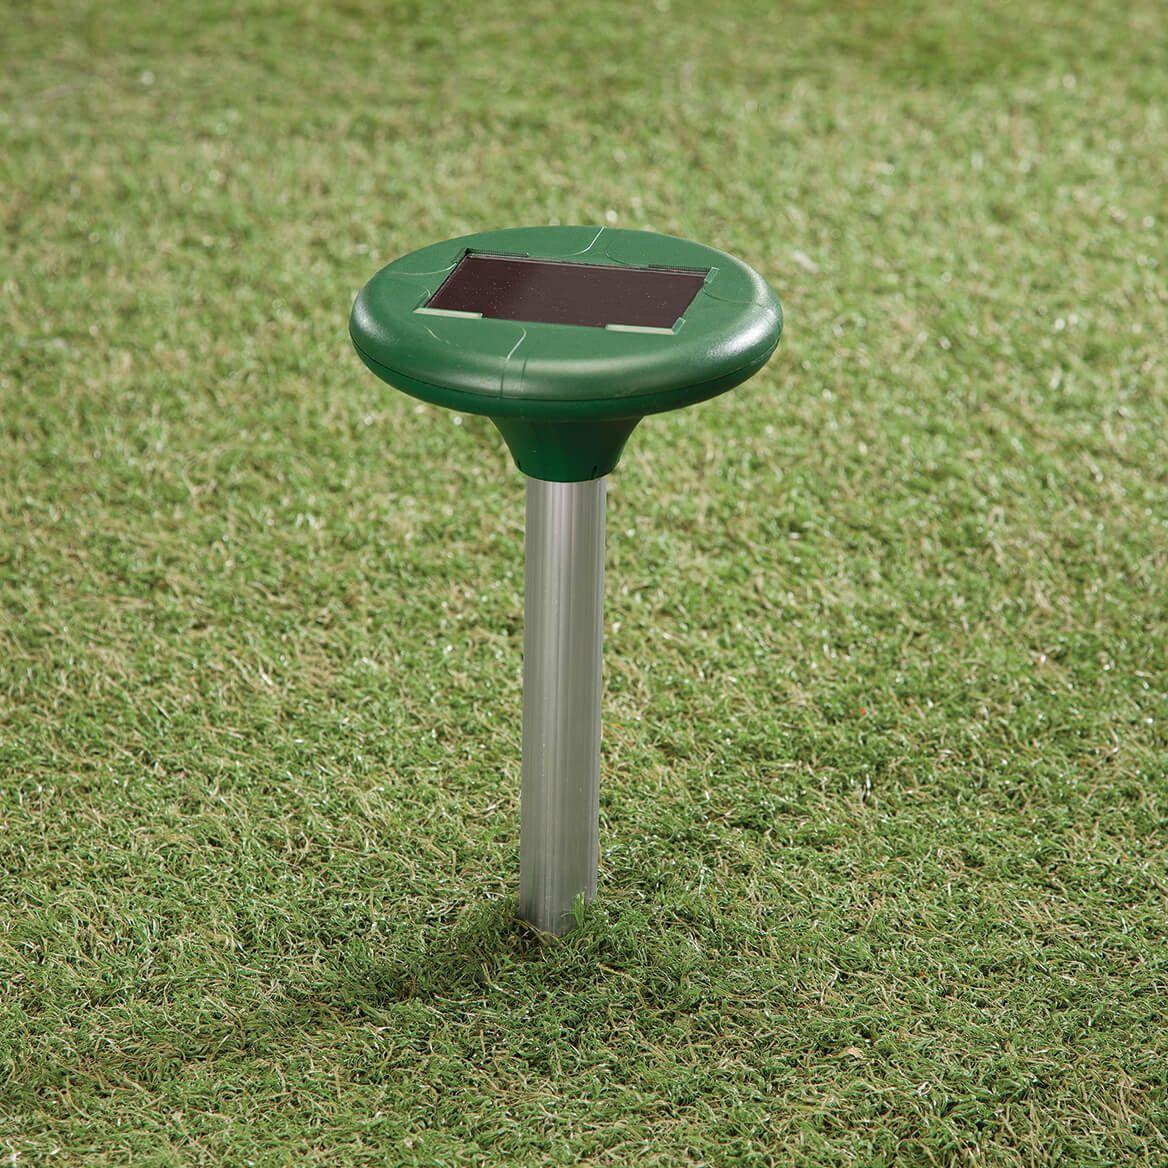 Solar Mole Repeller by Scare-D-Pest™-369052